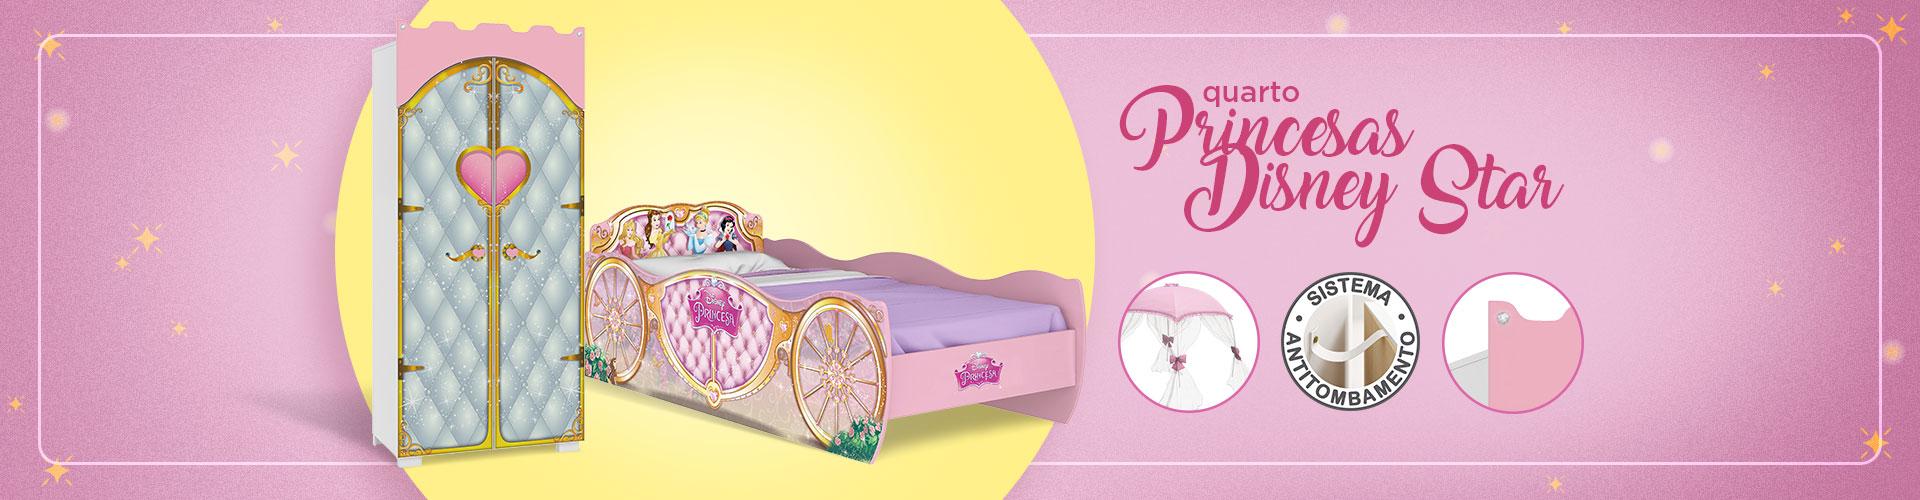 banner_meninas_princesas-play_barbie-plus